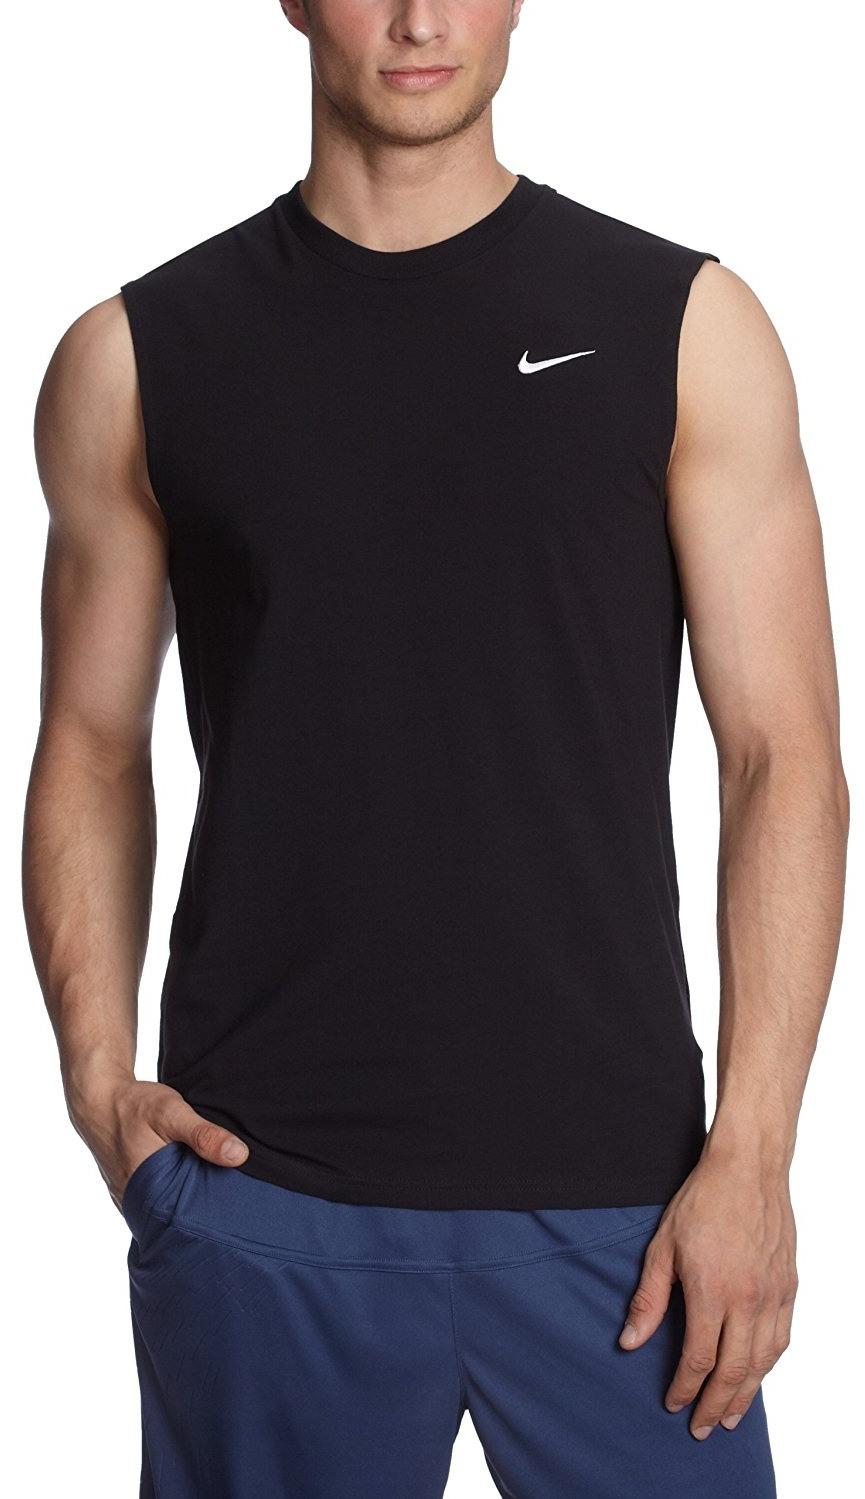 Nike  Nike Men's Ad Sleeveless Tshirtblack  Walmart